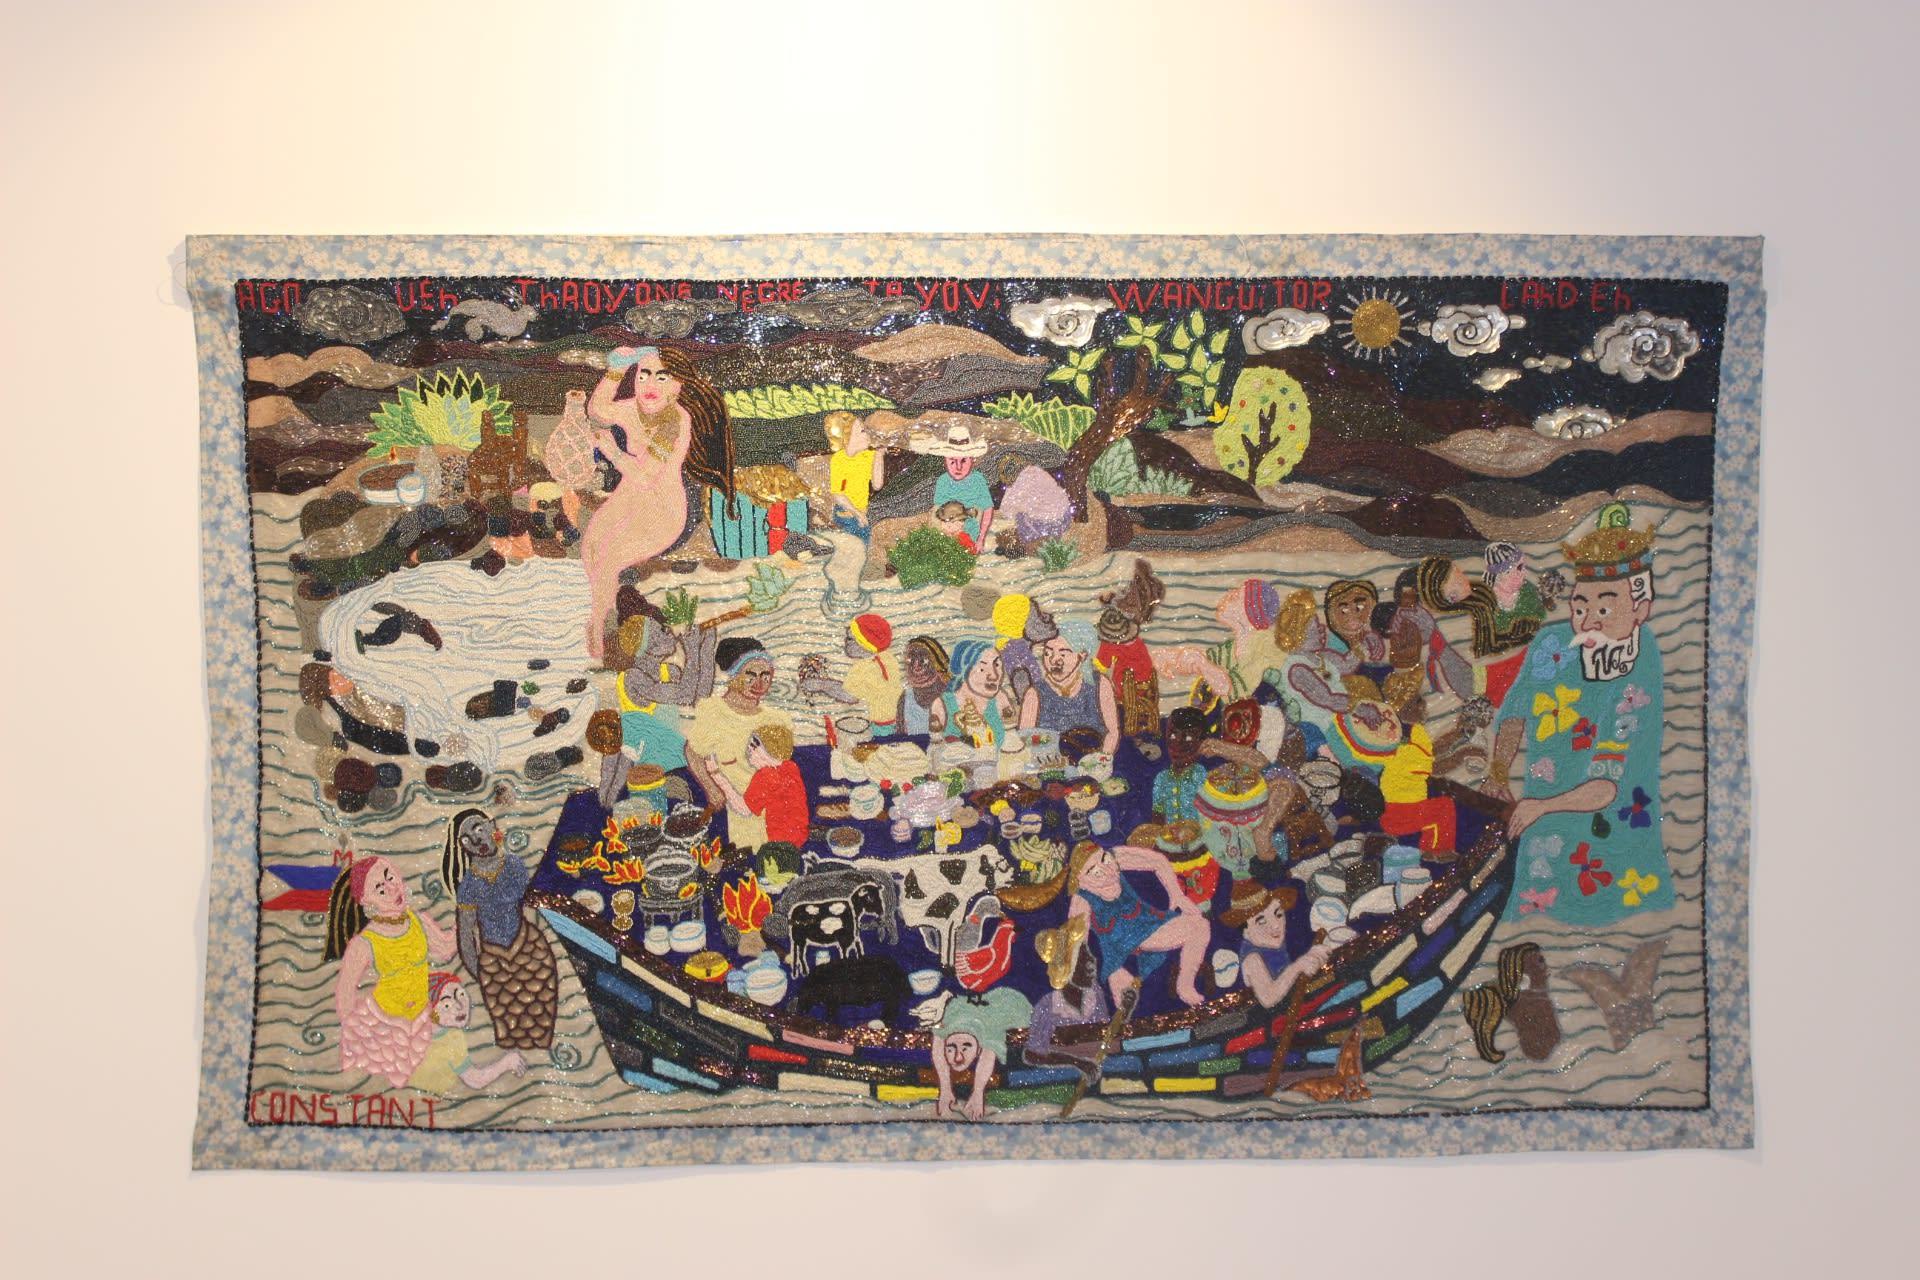 Myrlande Constant, Agwe, c.2005. Collection Bourbon-Lally, Beziers/Port-au-Prince.